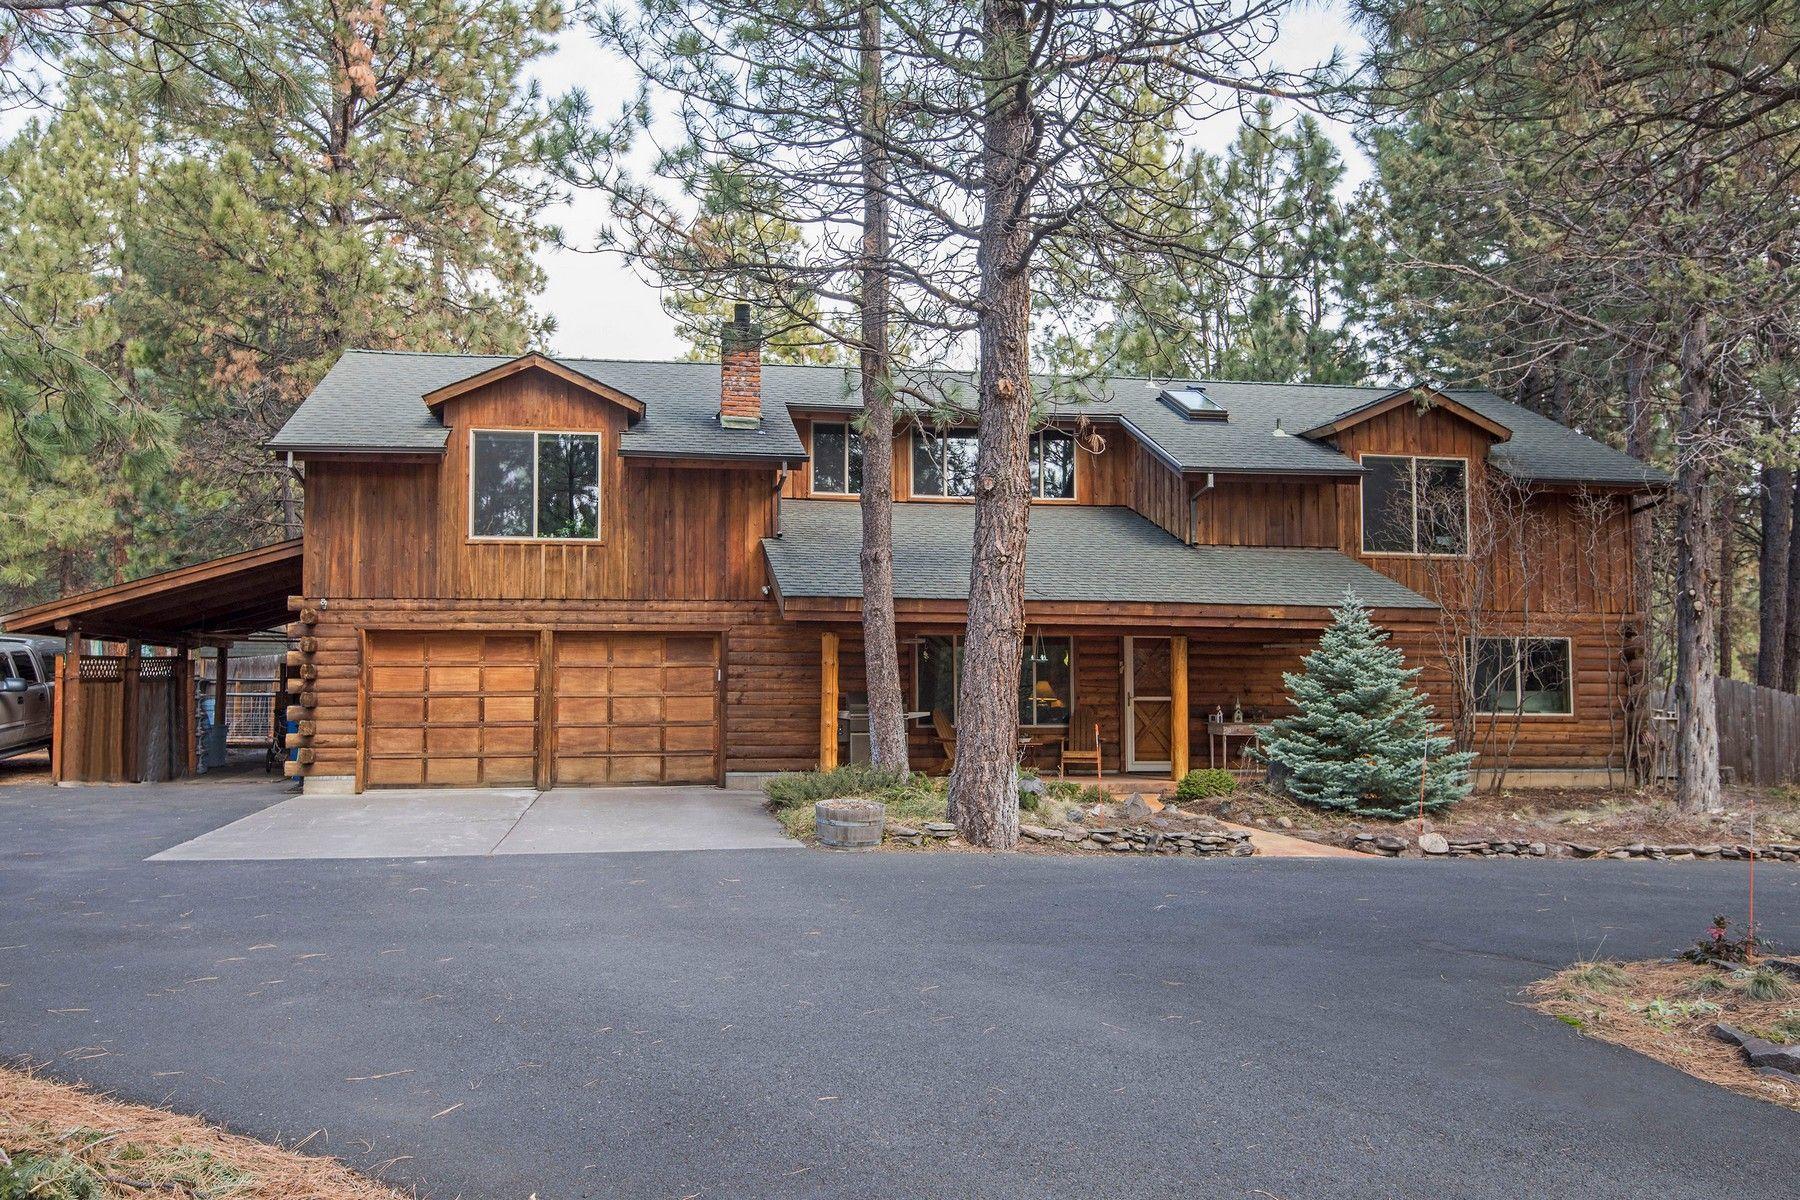 Other Residential Homes για την Πώληση στο 14826 Crupper Sisters, OR 97759 Sisters, Ορεγκον 97759 Ηνωμένες Πολιτείες